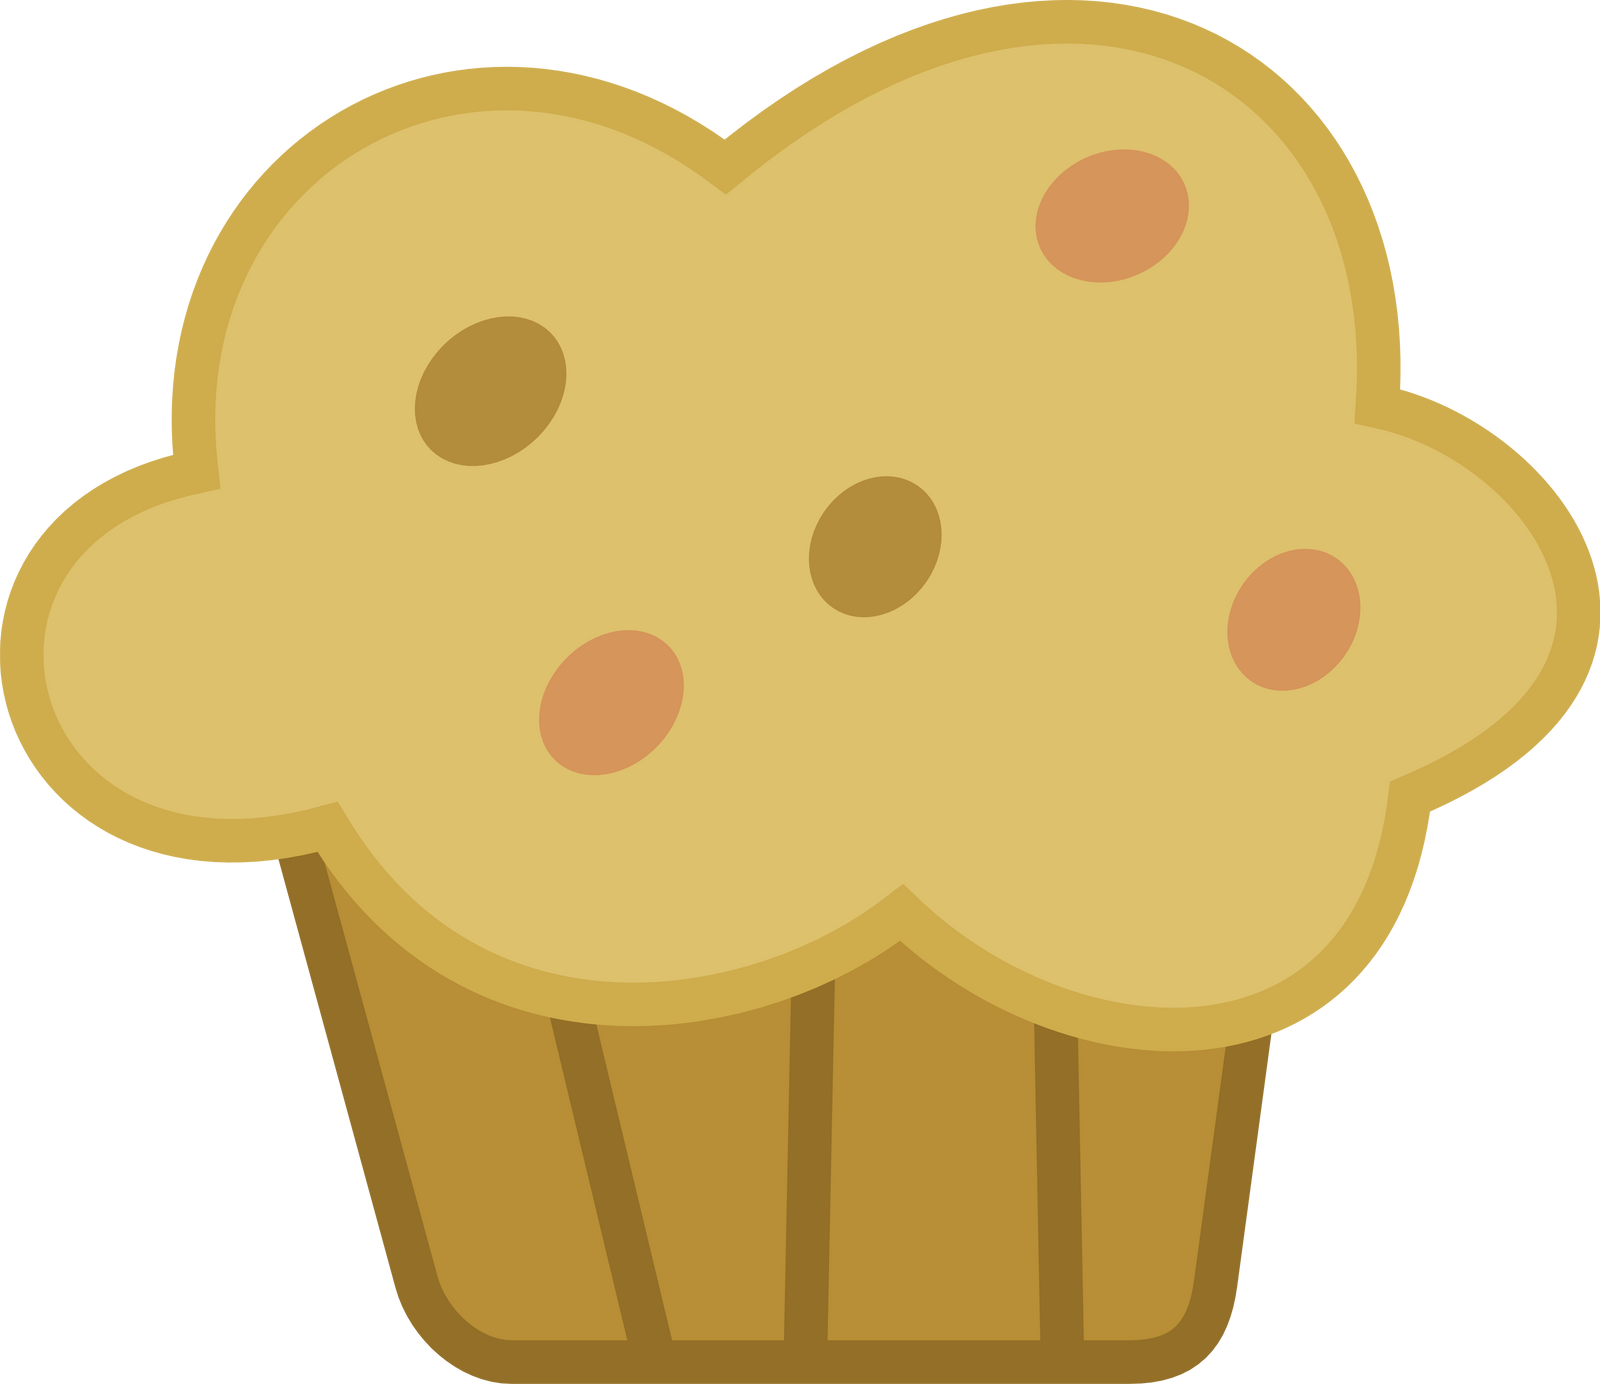 Spectacular muffin